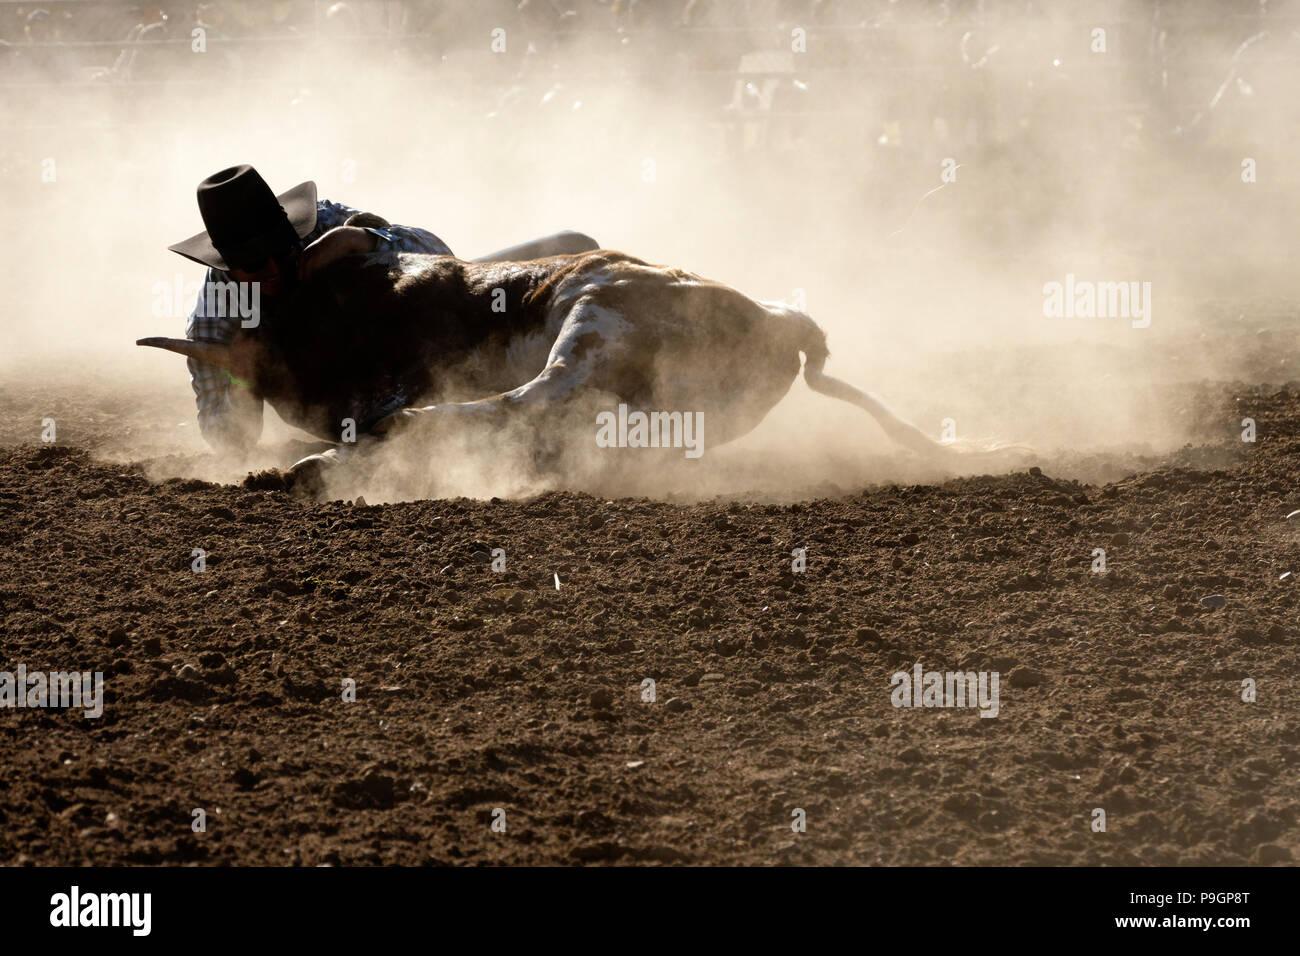 Rodeo Cowboy Australia Stock Photos Amp Rodeo Cowboy